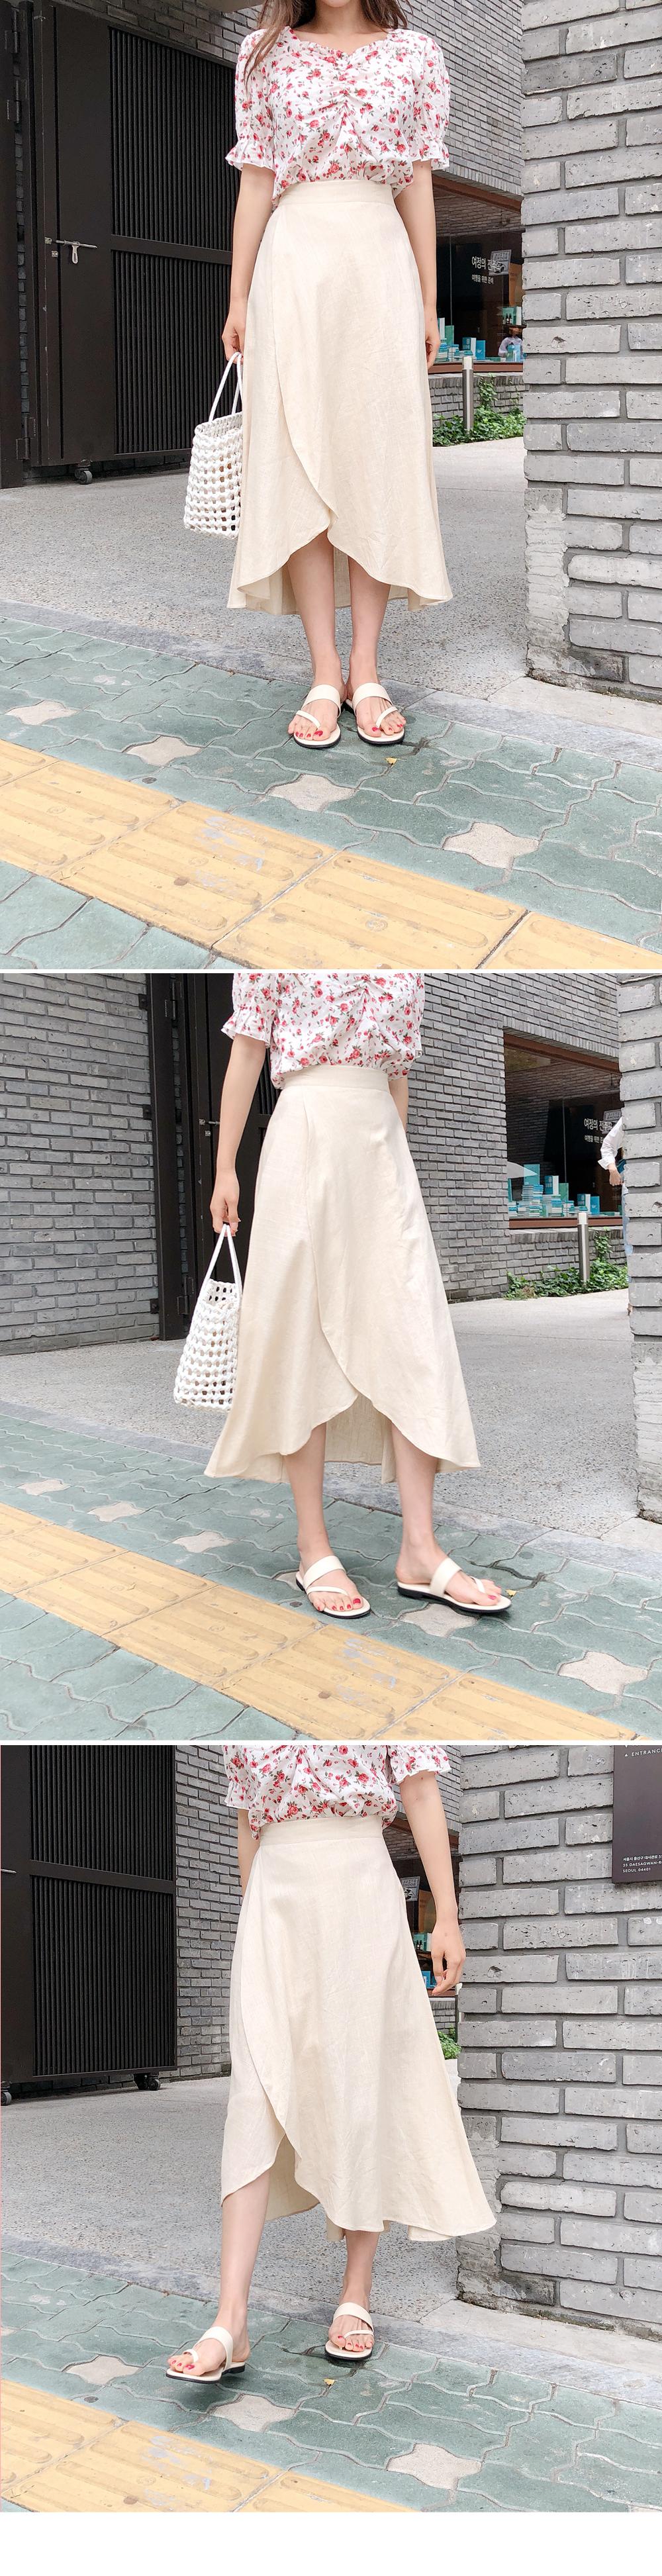 Round front skirt